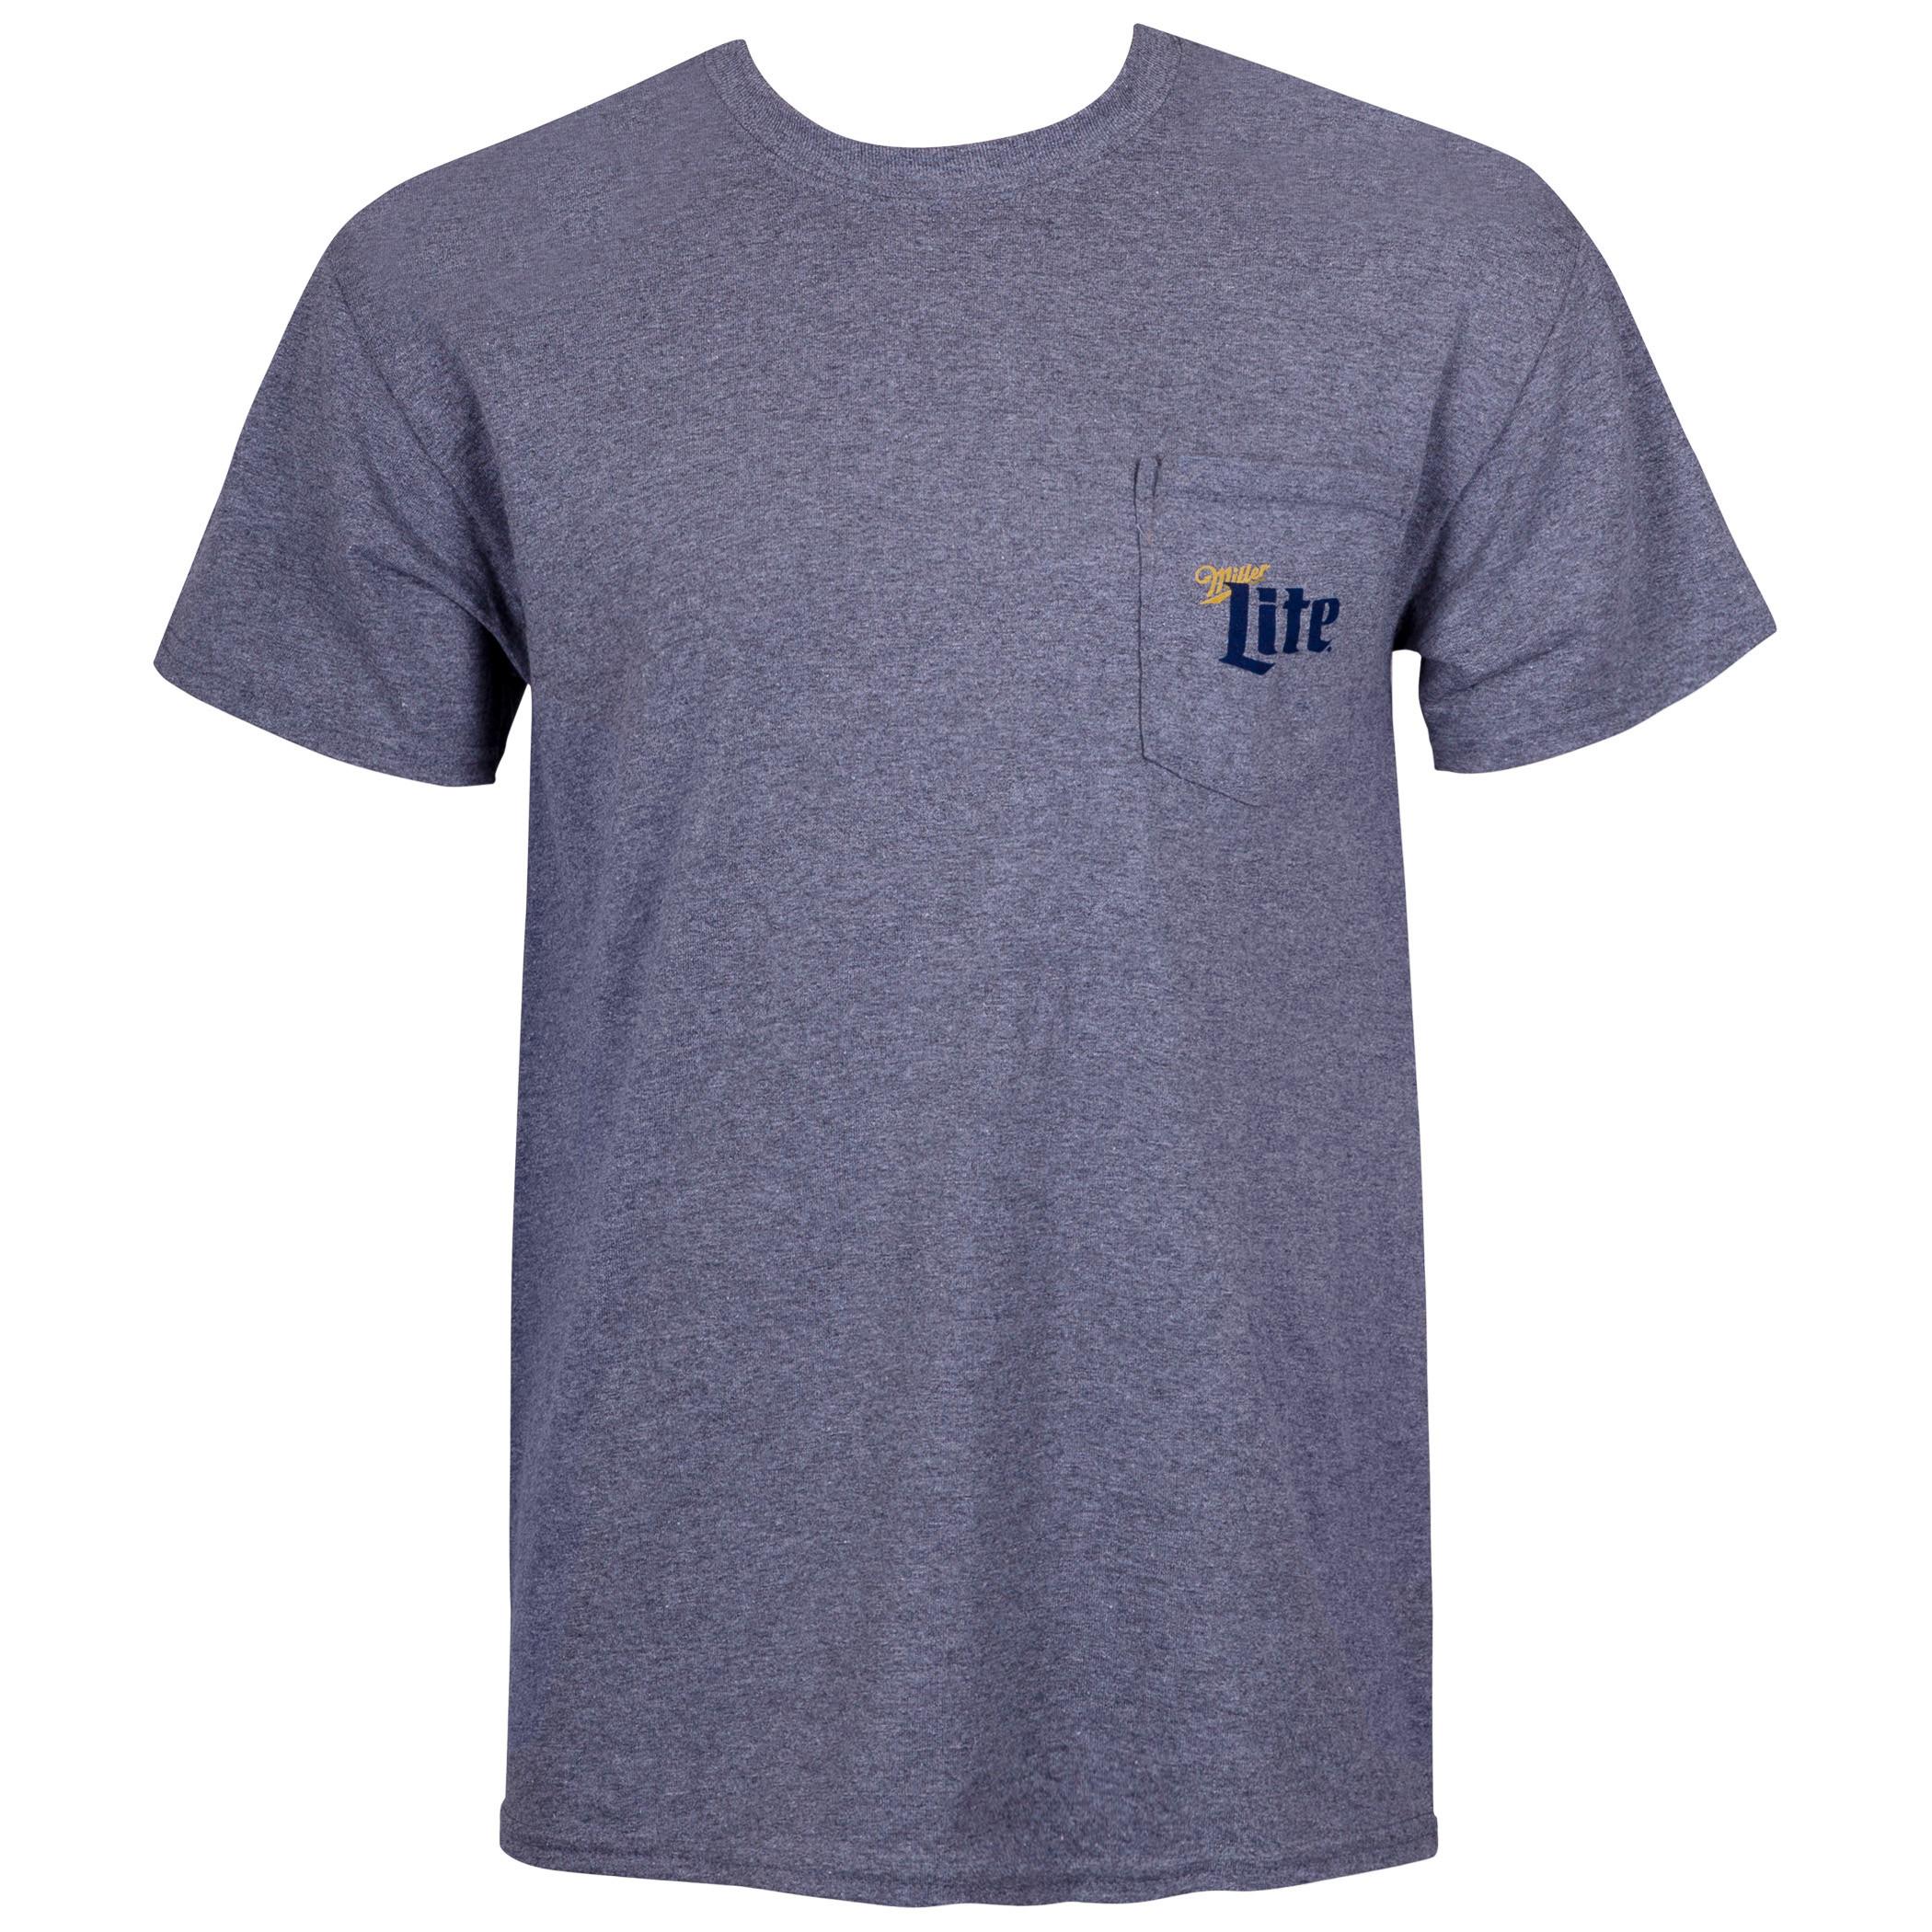 Miller Lite Grey Pocket Tee Shirt